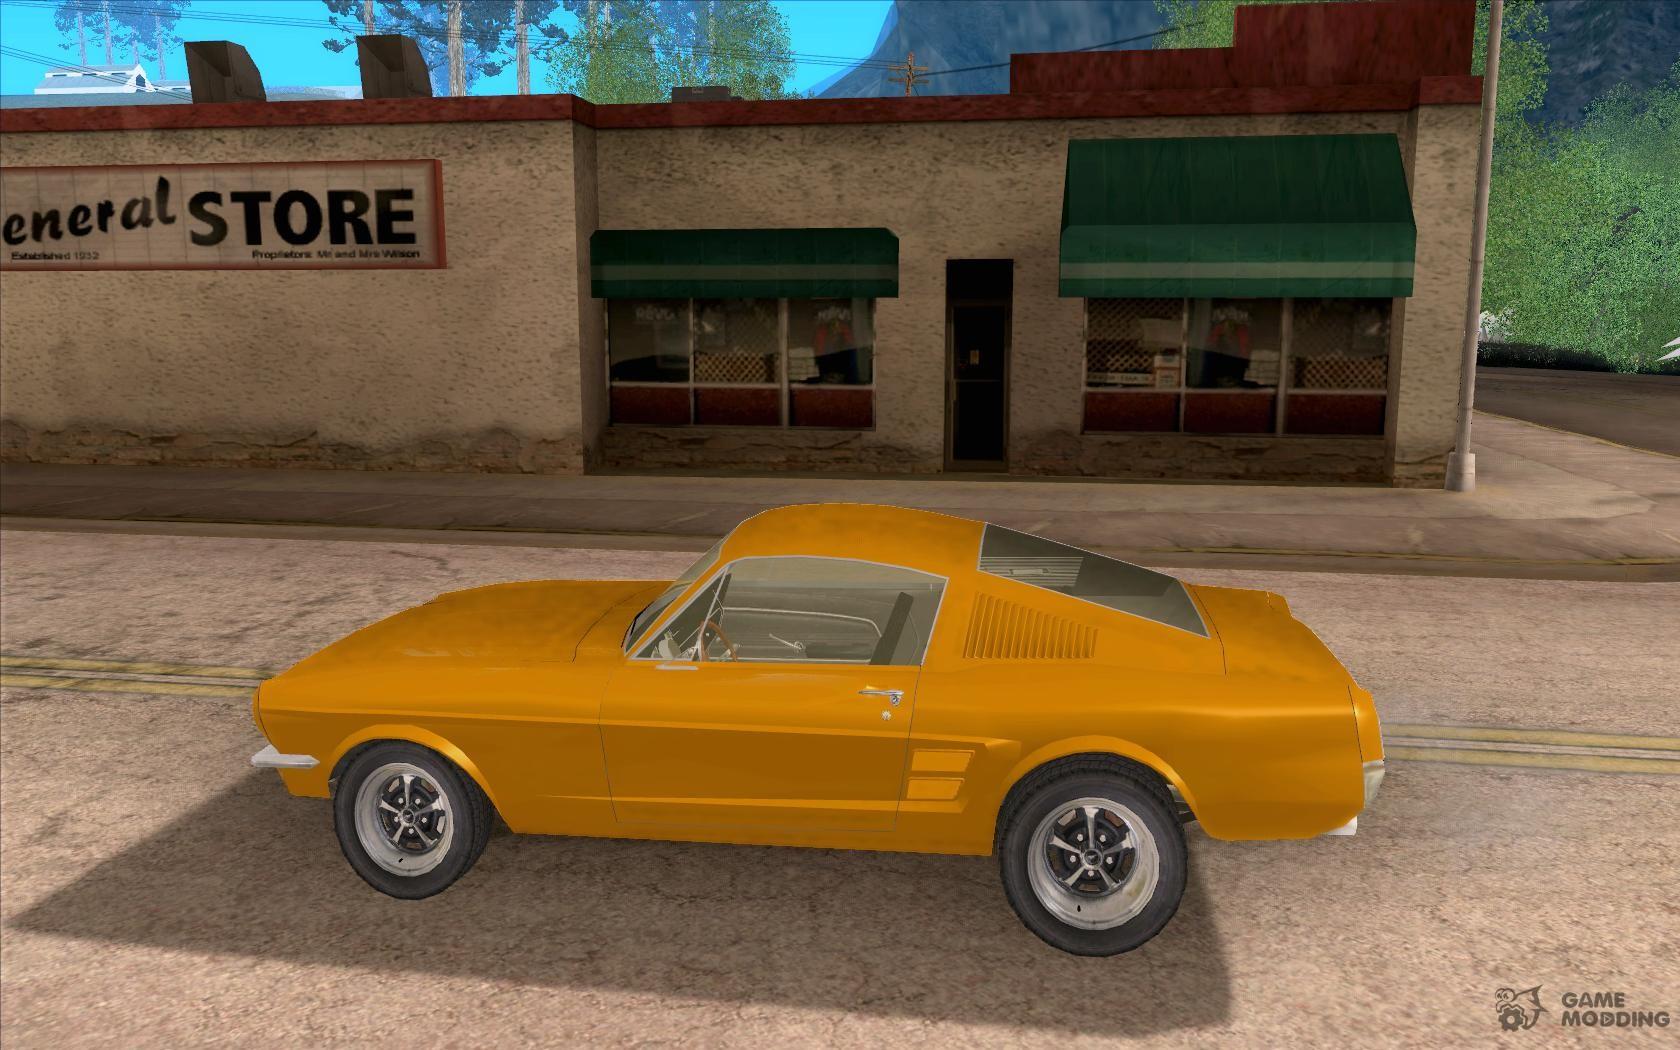 Mustang fastback 1967 for gta san andreas miniature 6 761